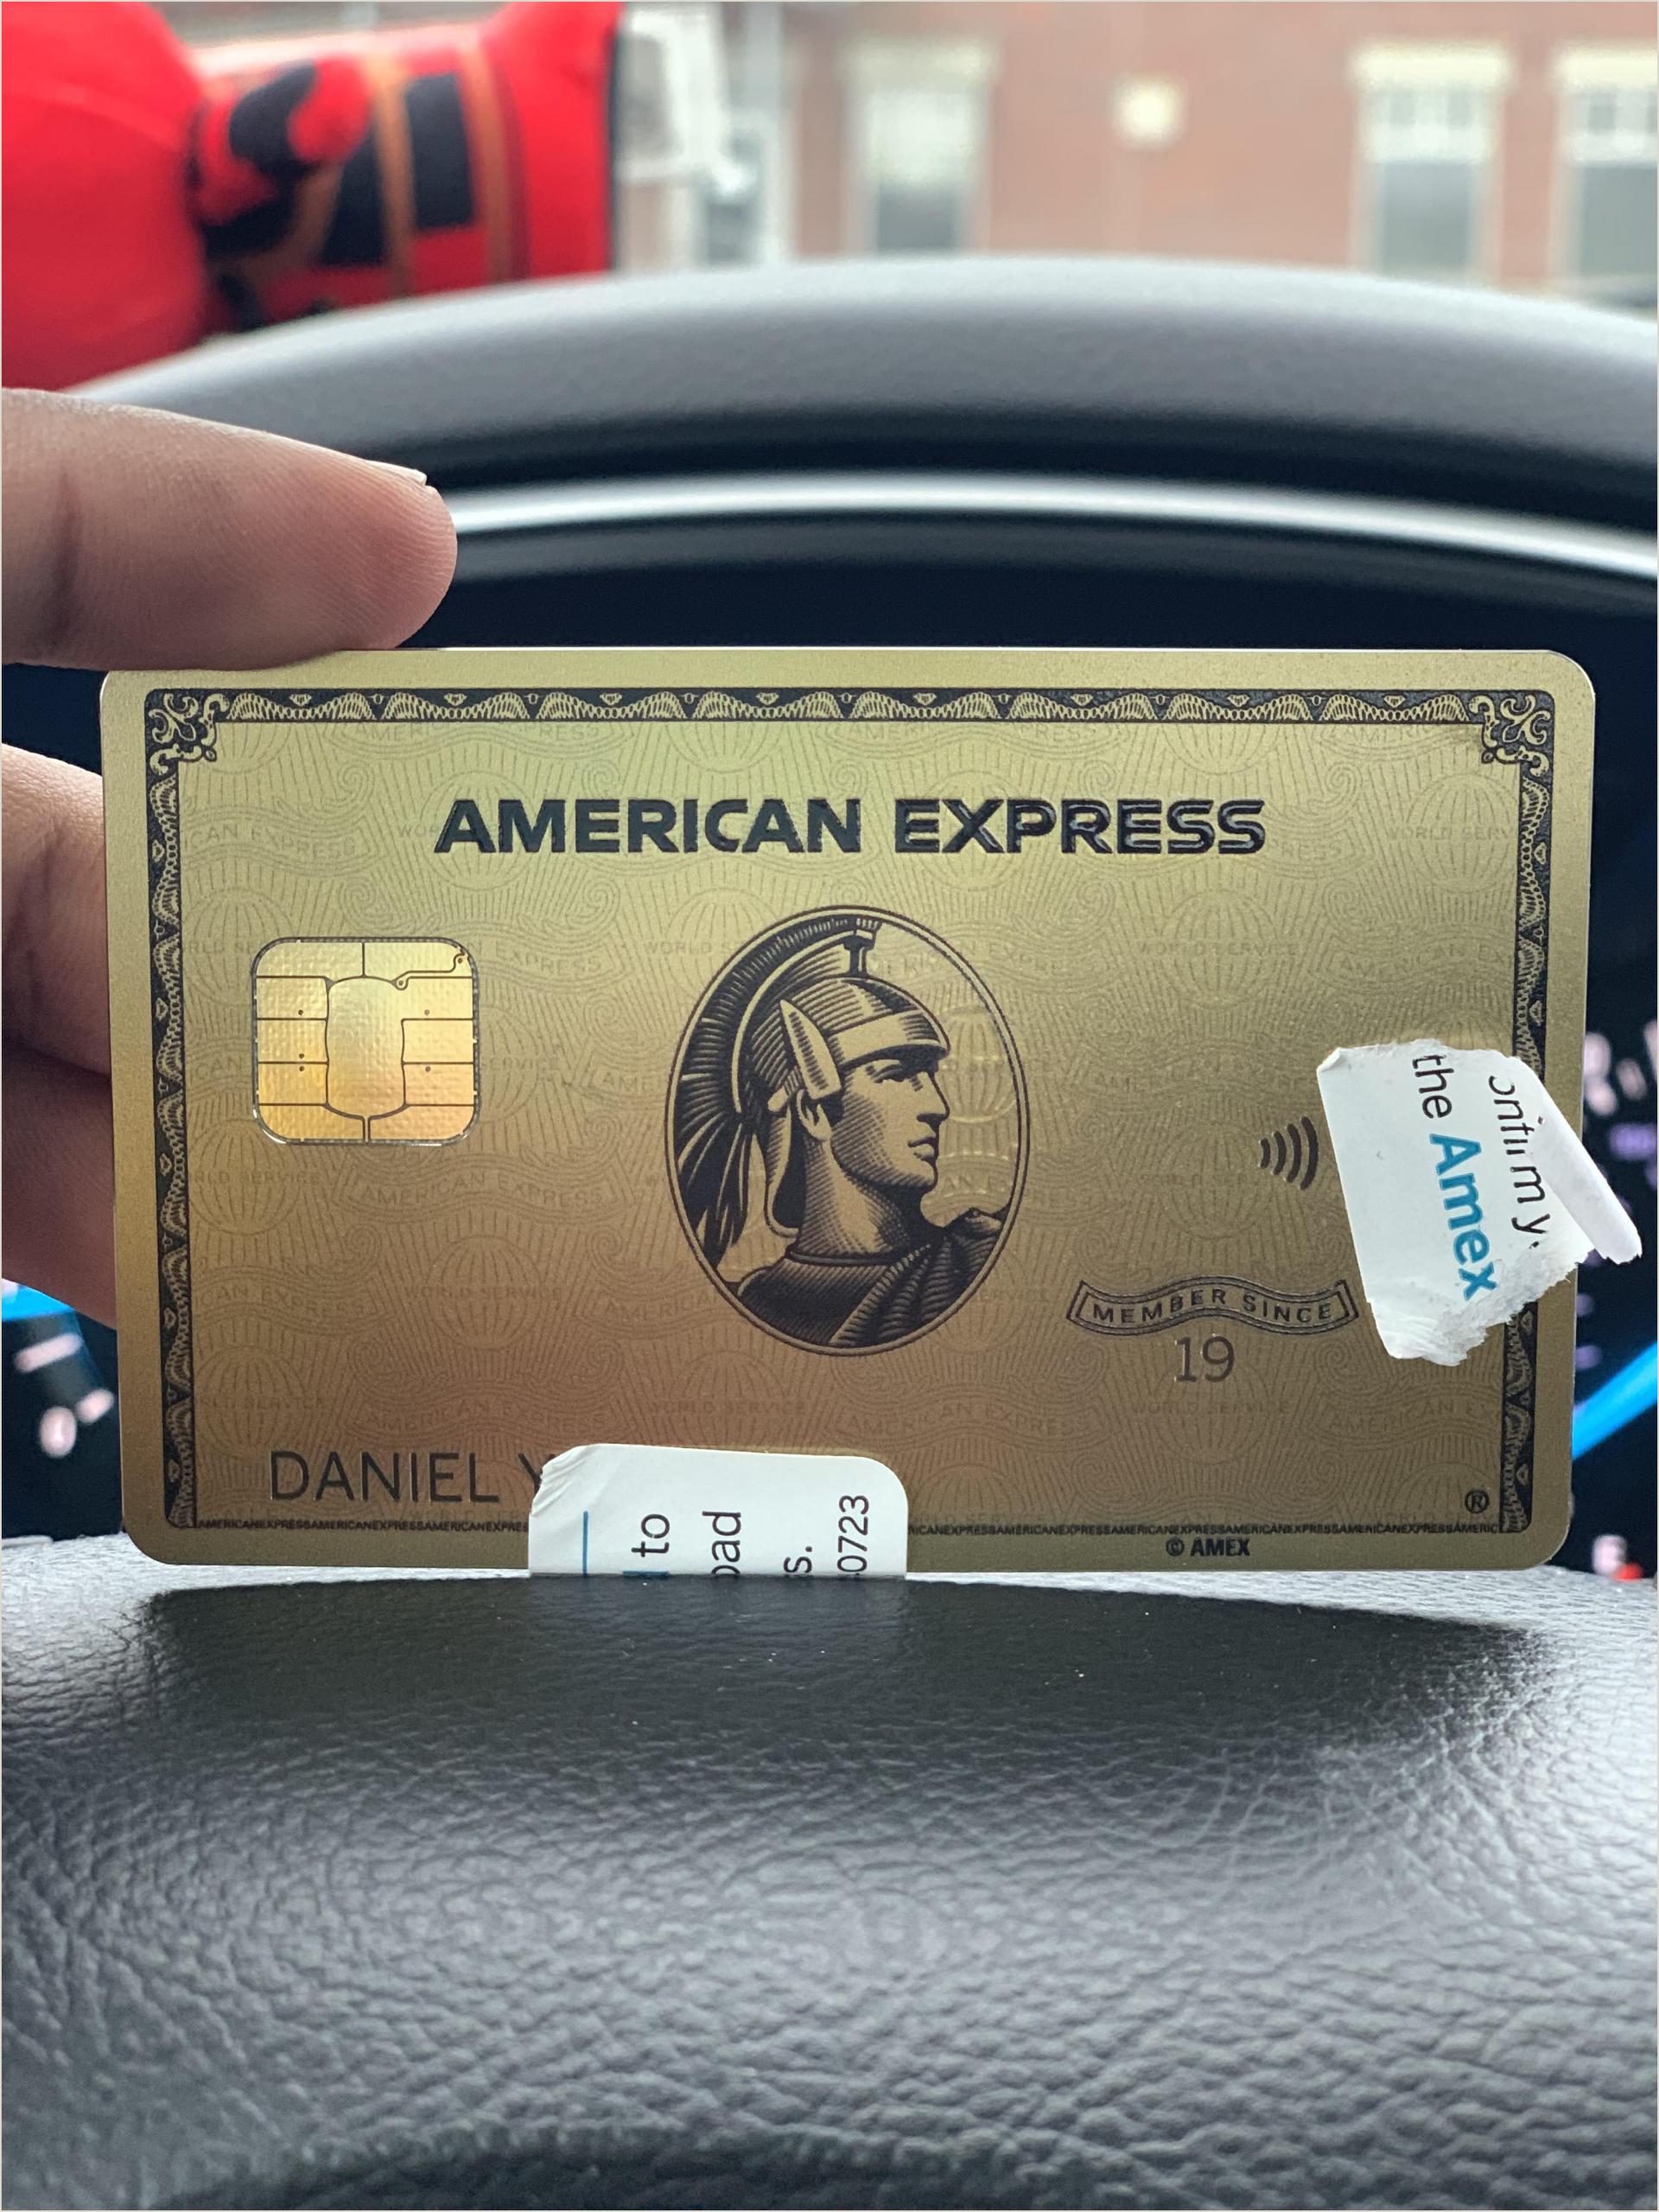 Reddit Churning Best Business Cards Best Travel Credit Card No Annual Fee Reddit